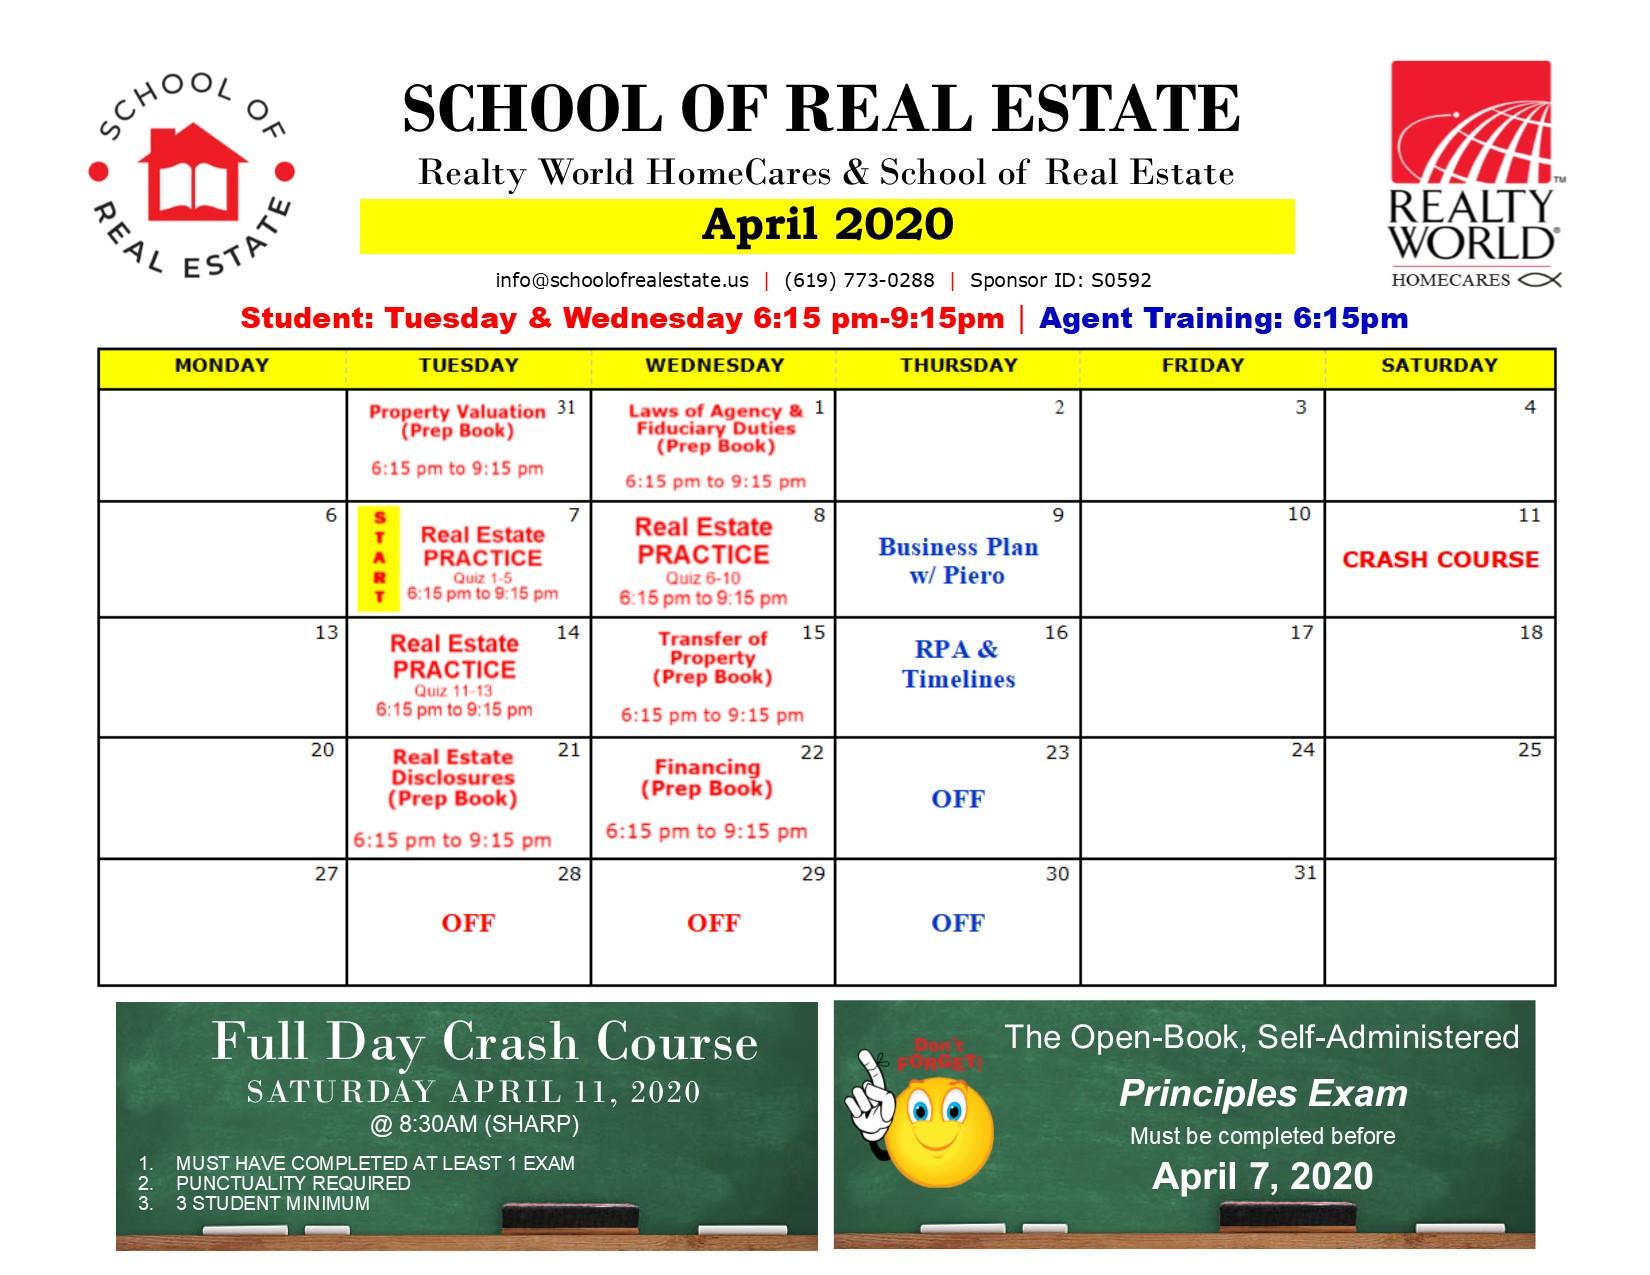 SchoolOfRealEstate_Newsletter_2020April